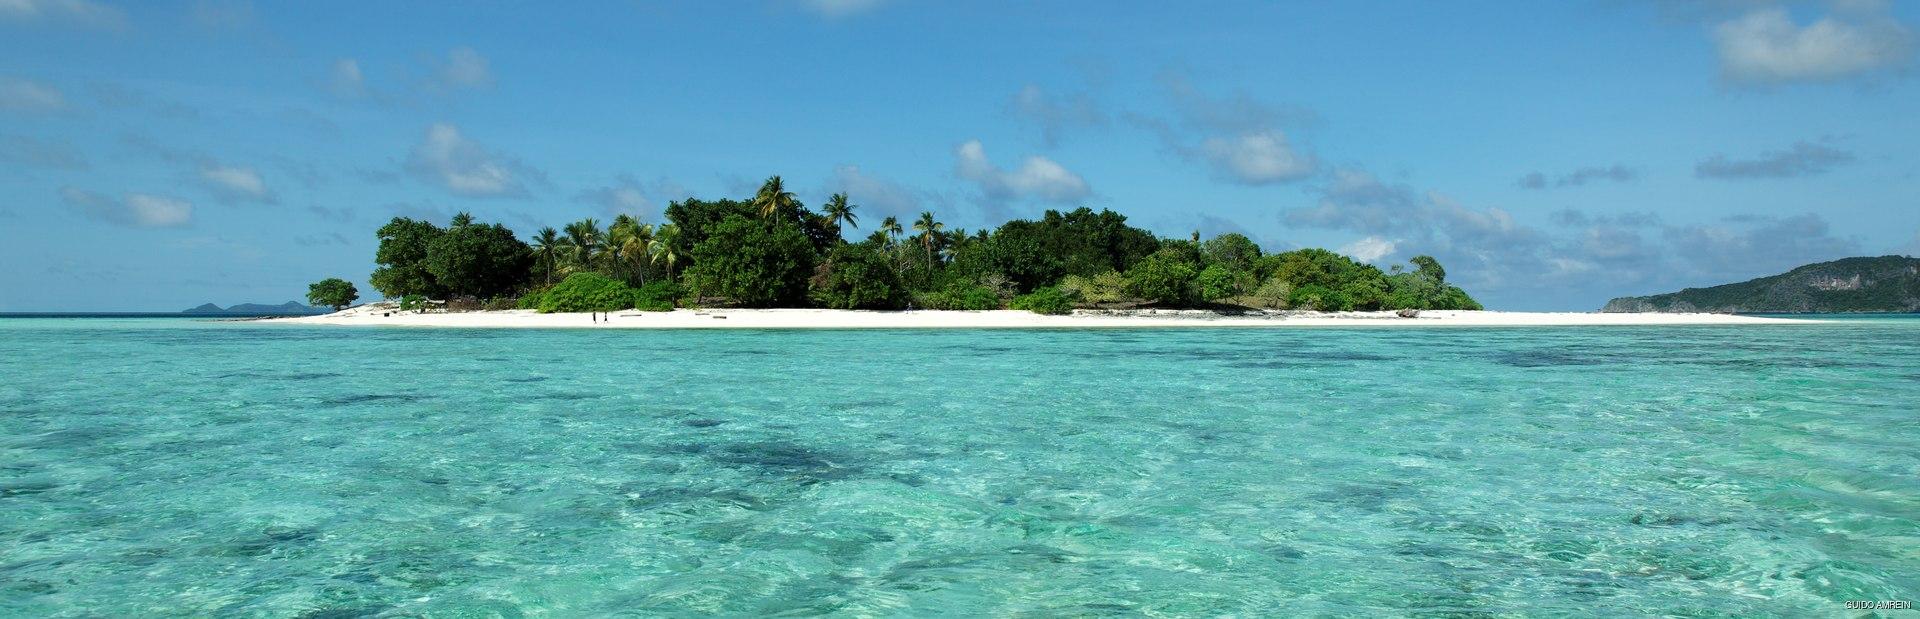 View n the green island